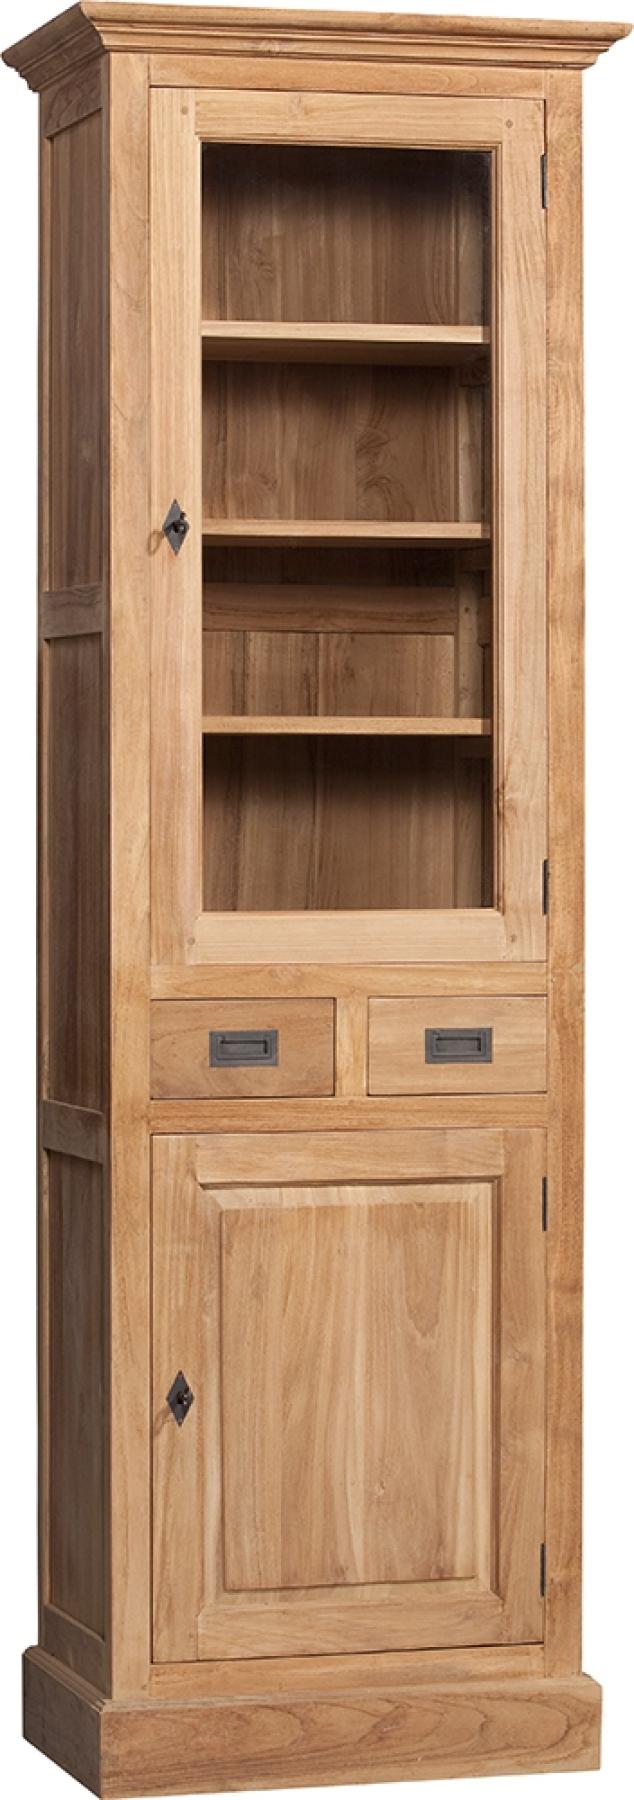 Bücherschrank Naturholz